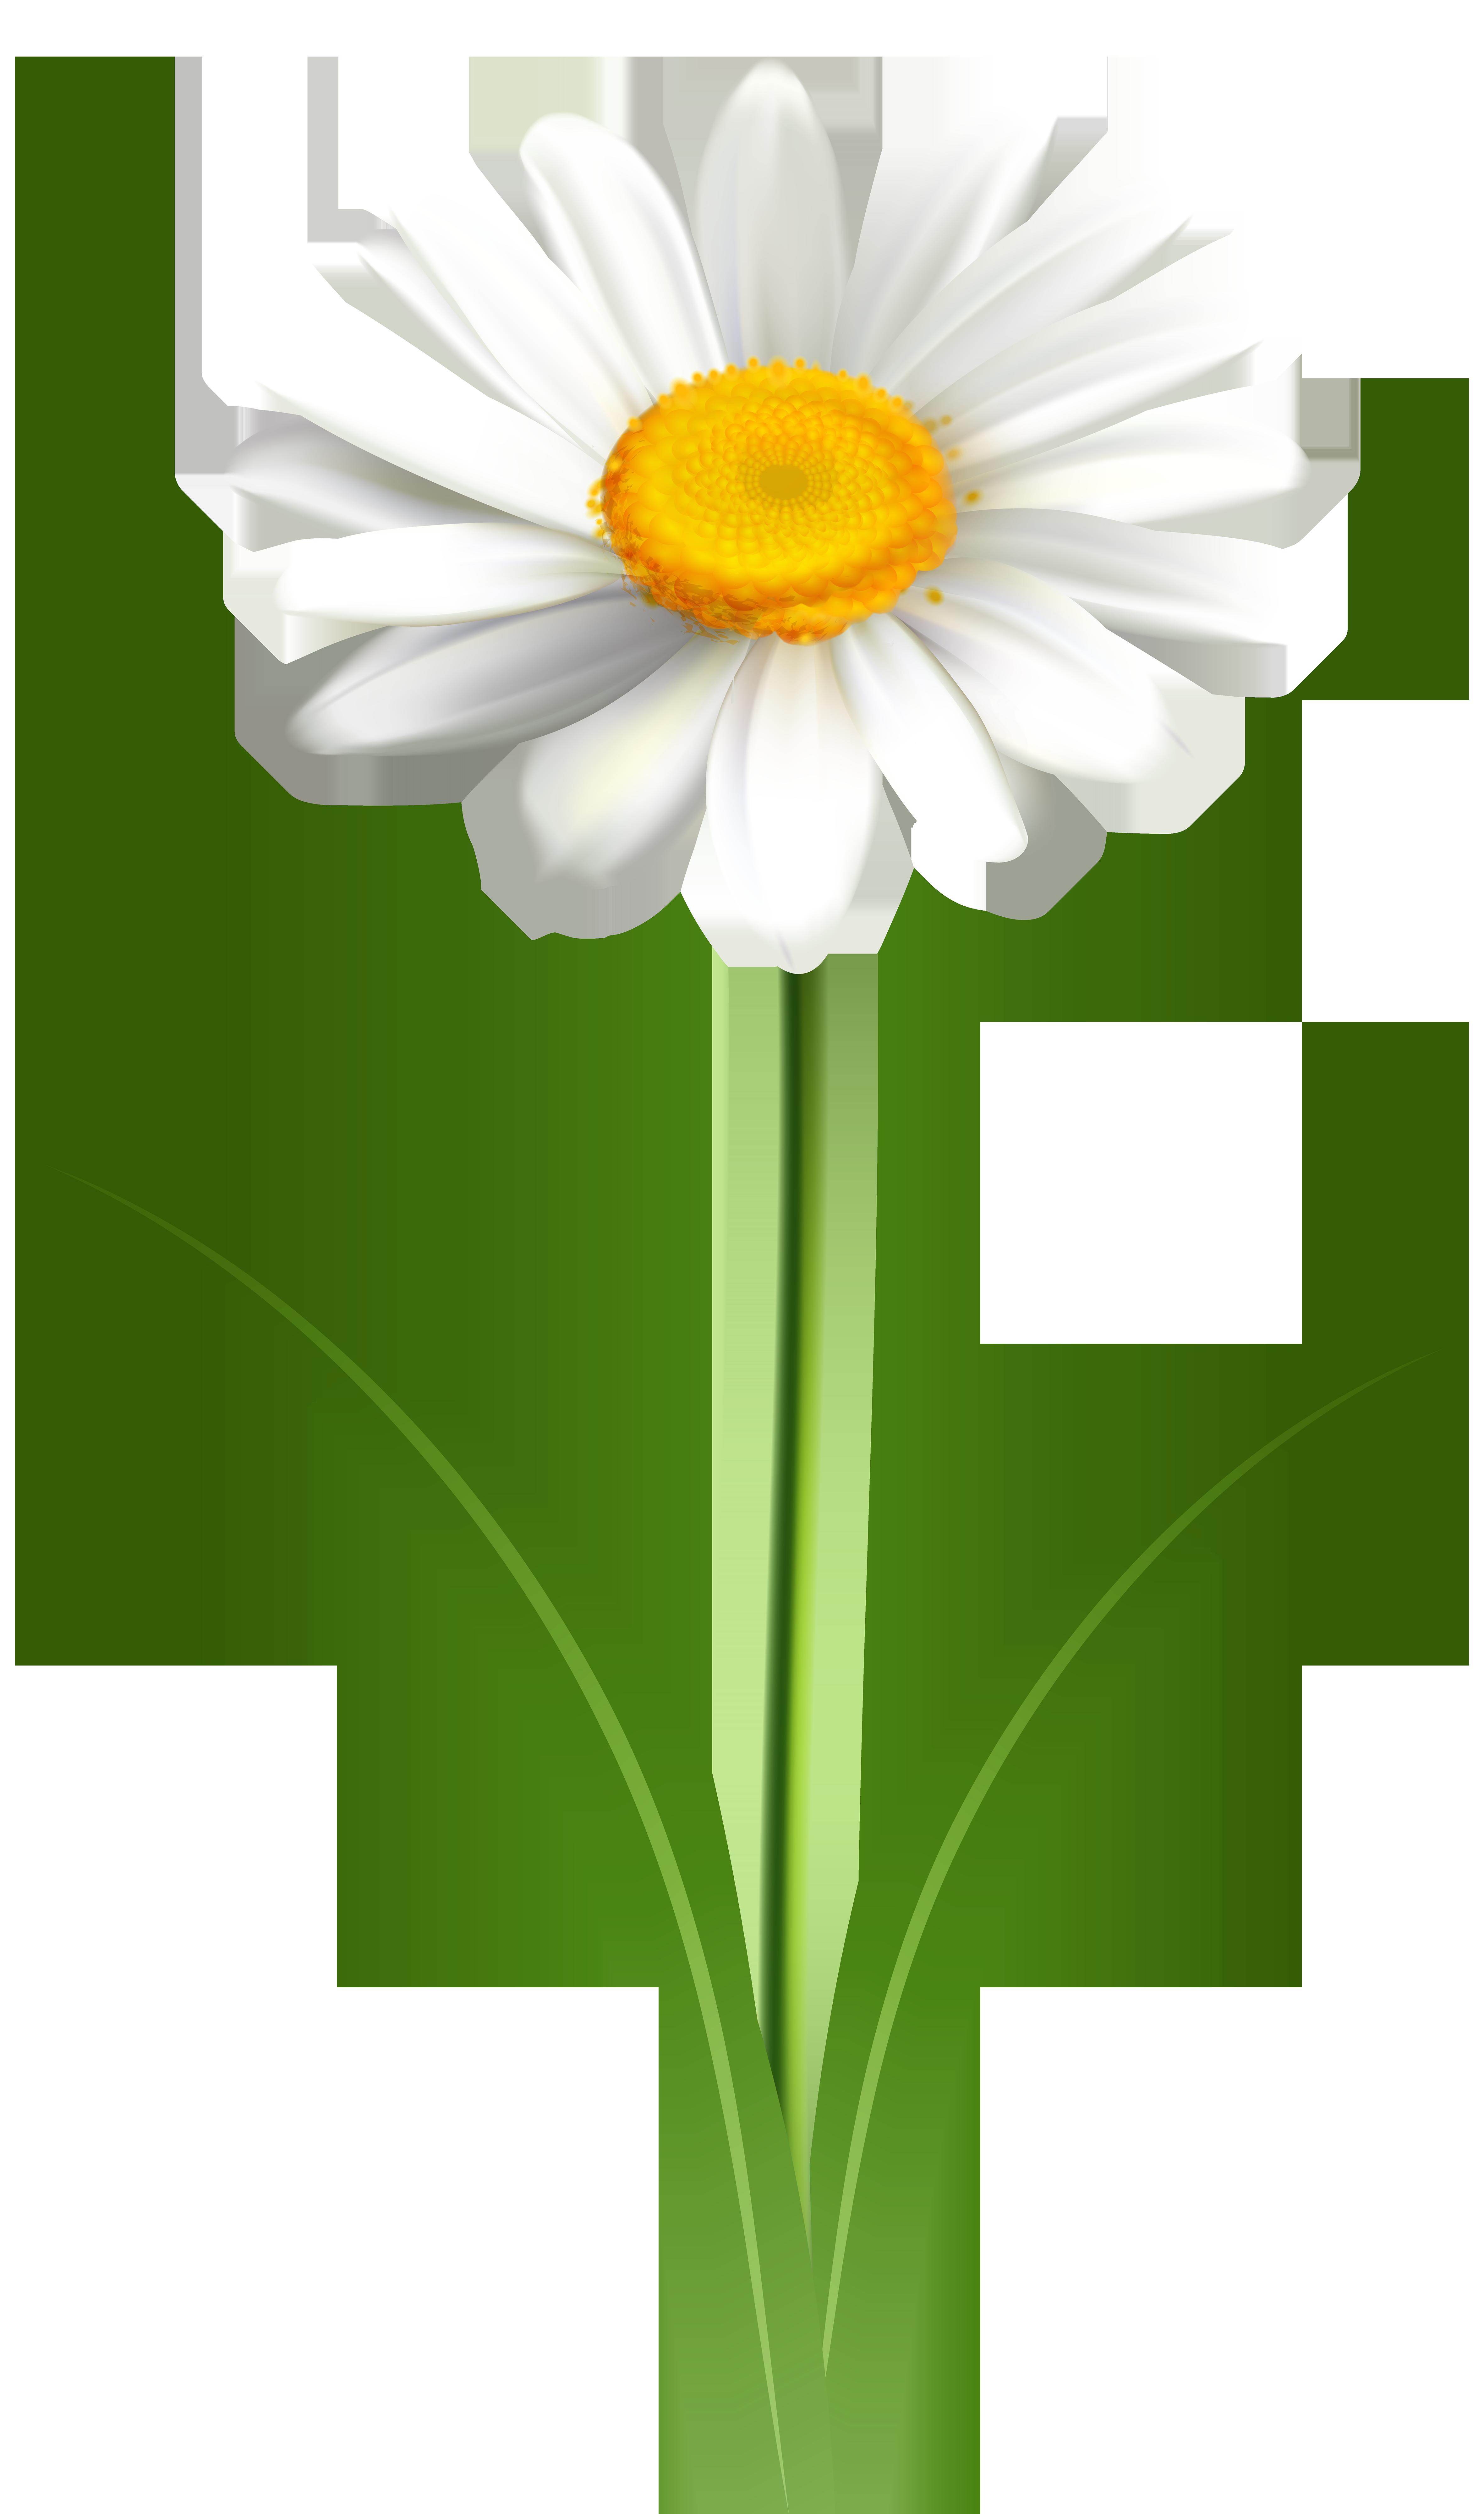 clip art free download Flower transparent png clip. Daisy clipart